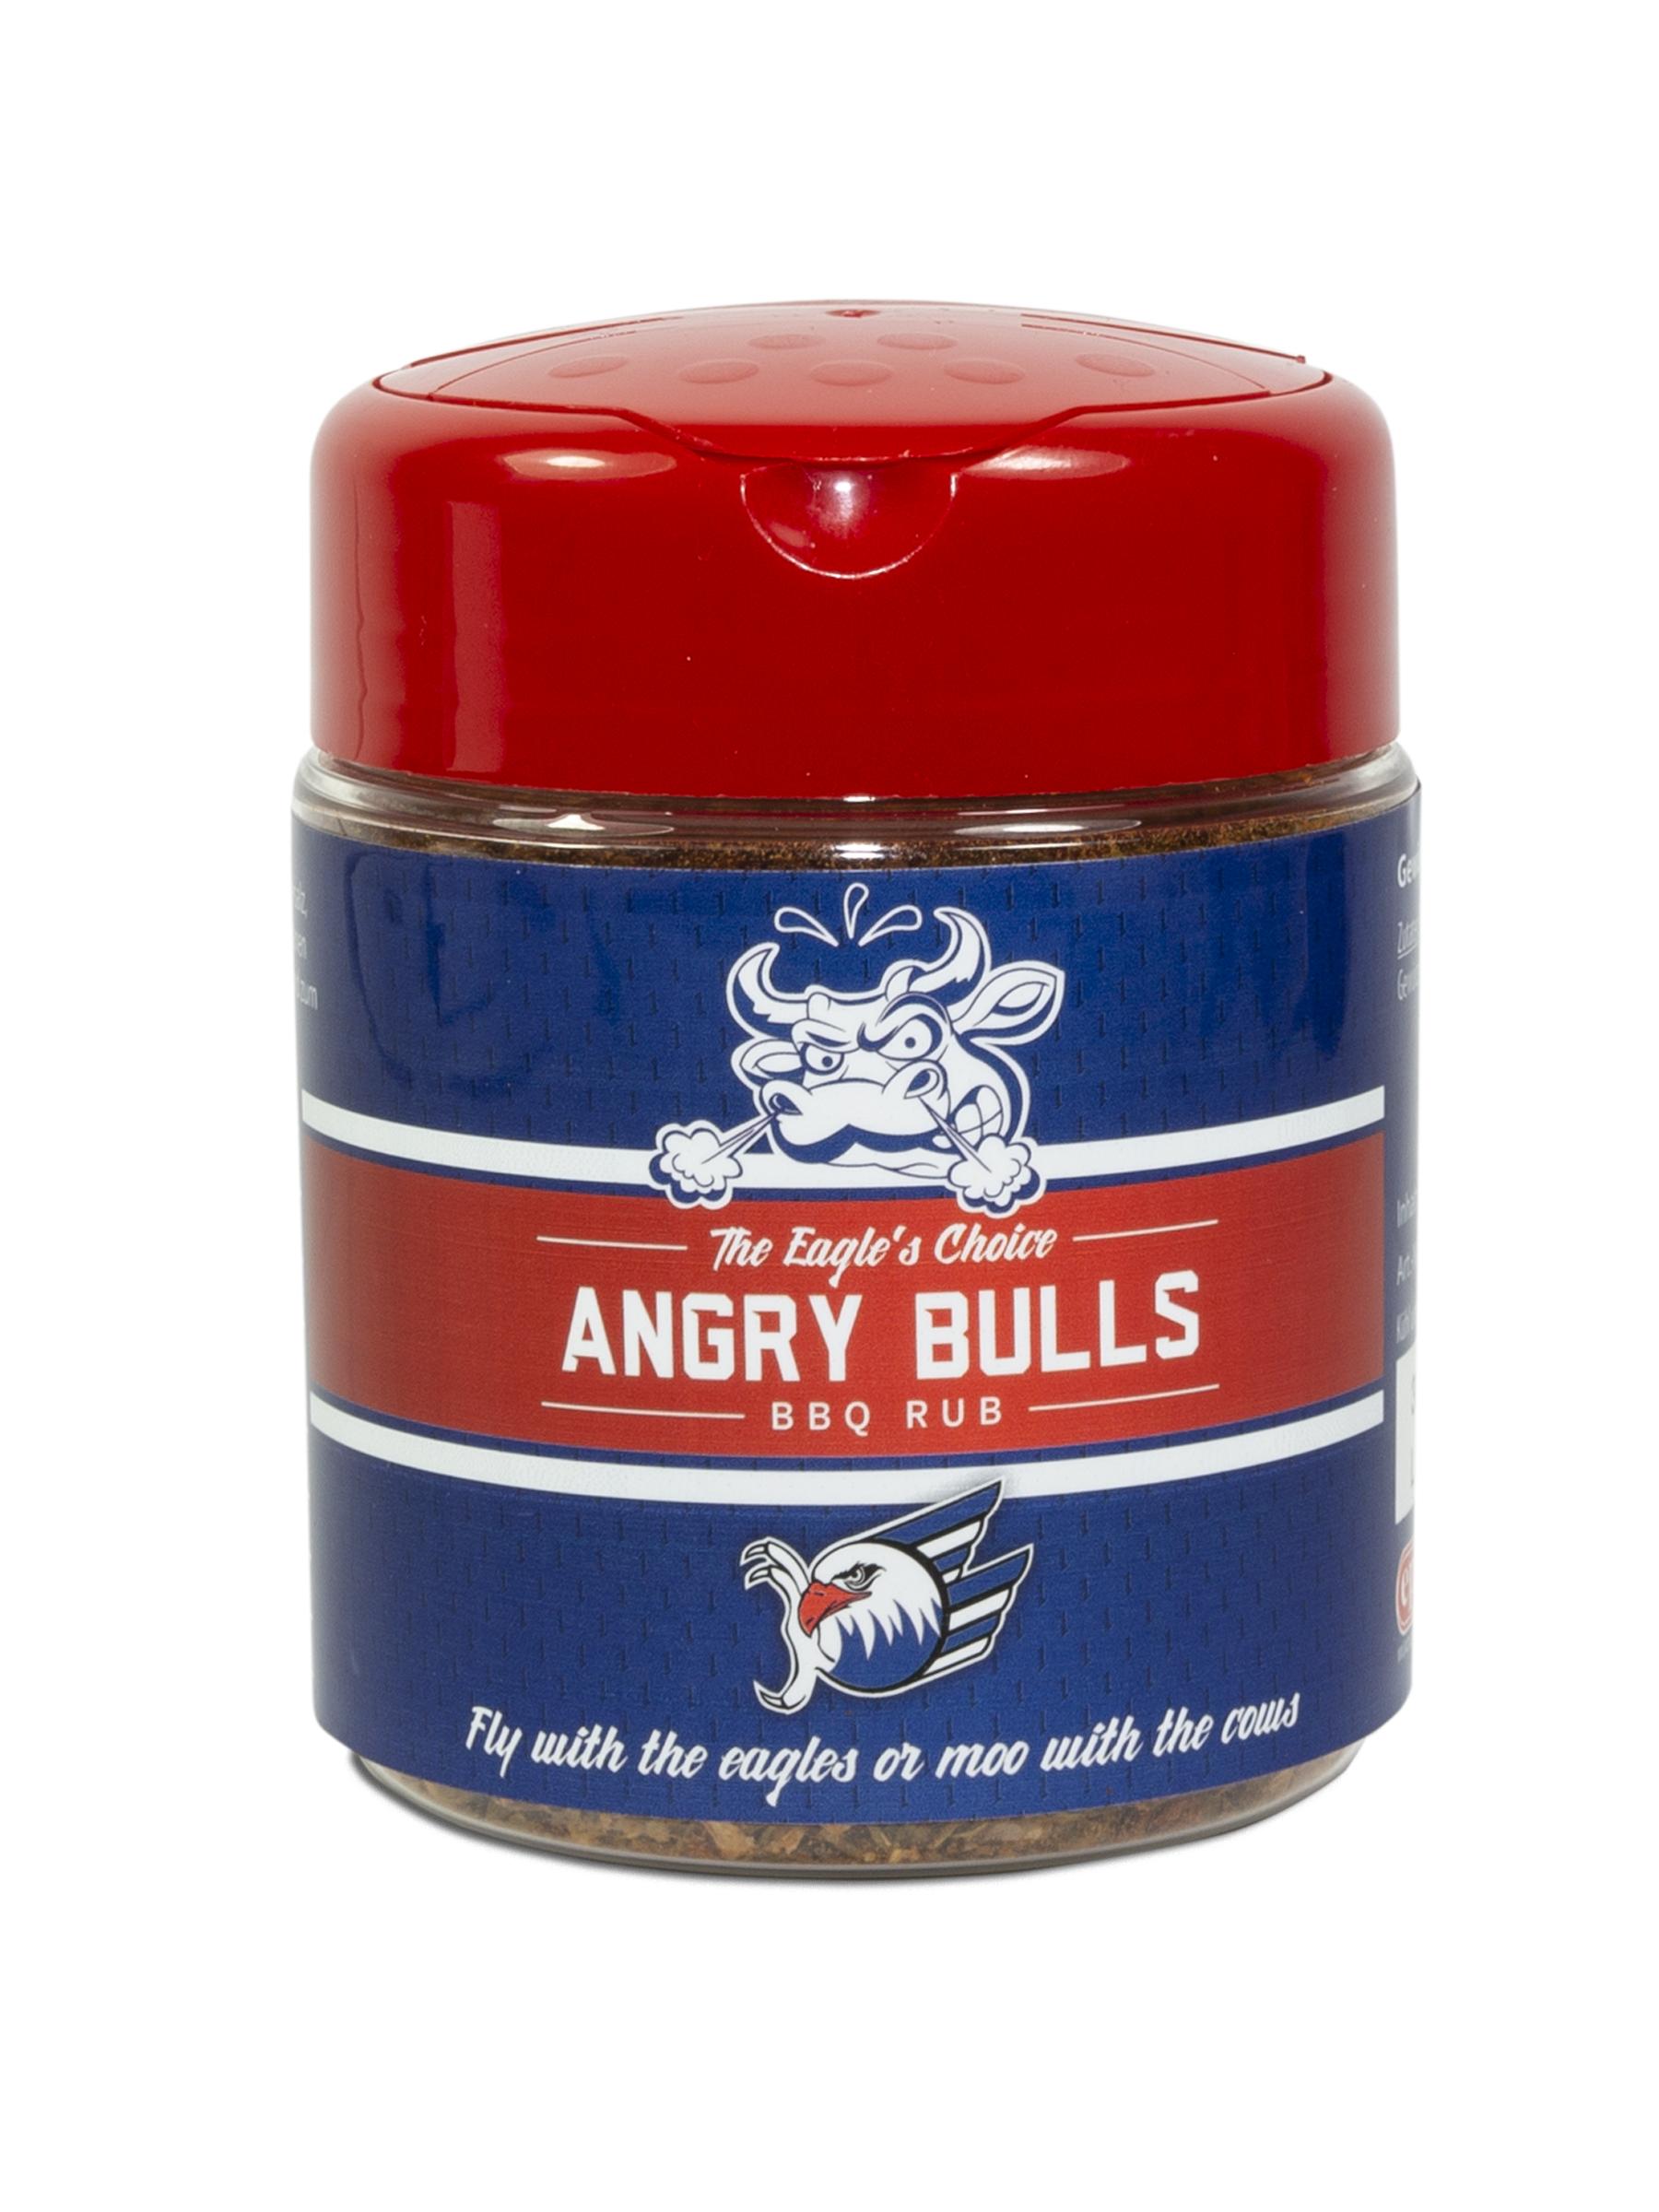 Angry Bulls BBQ Rub